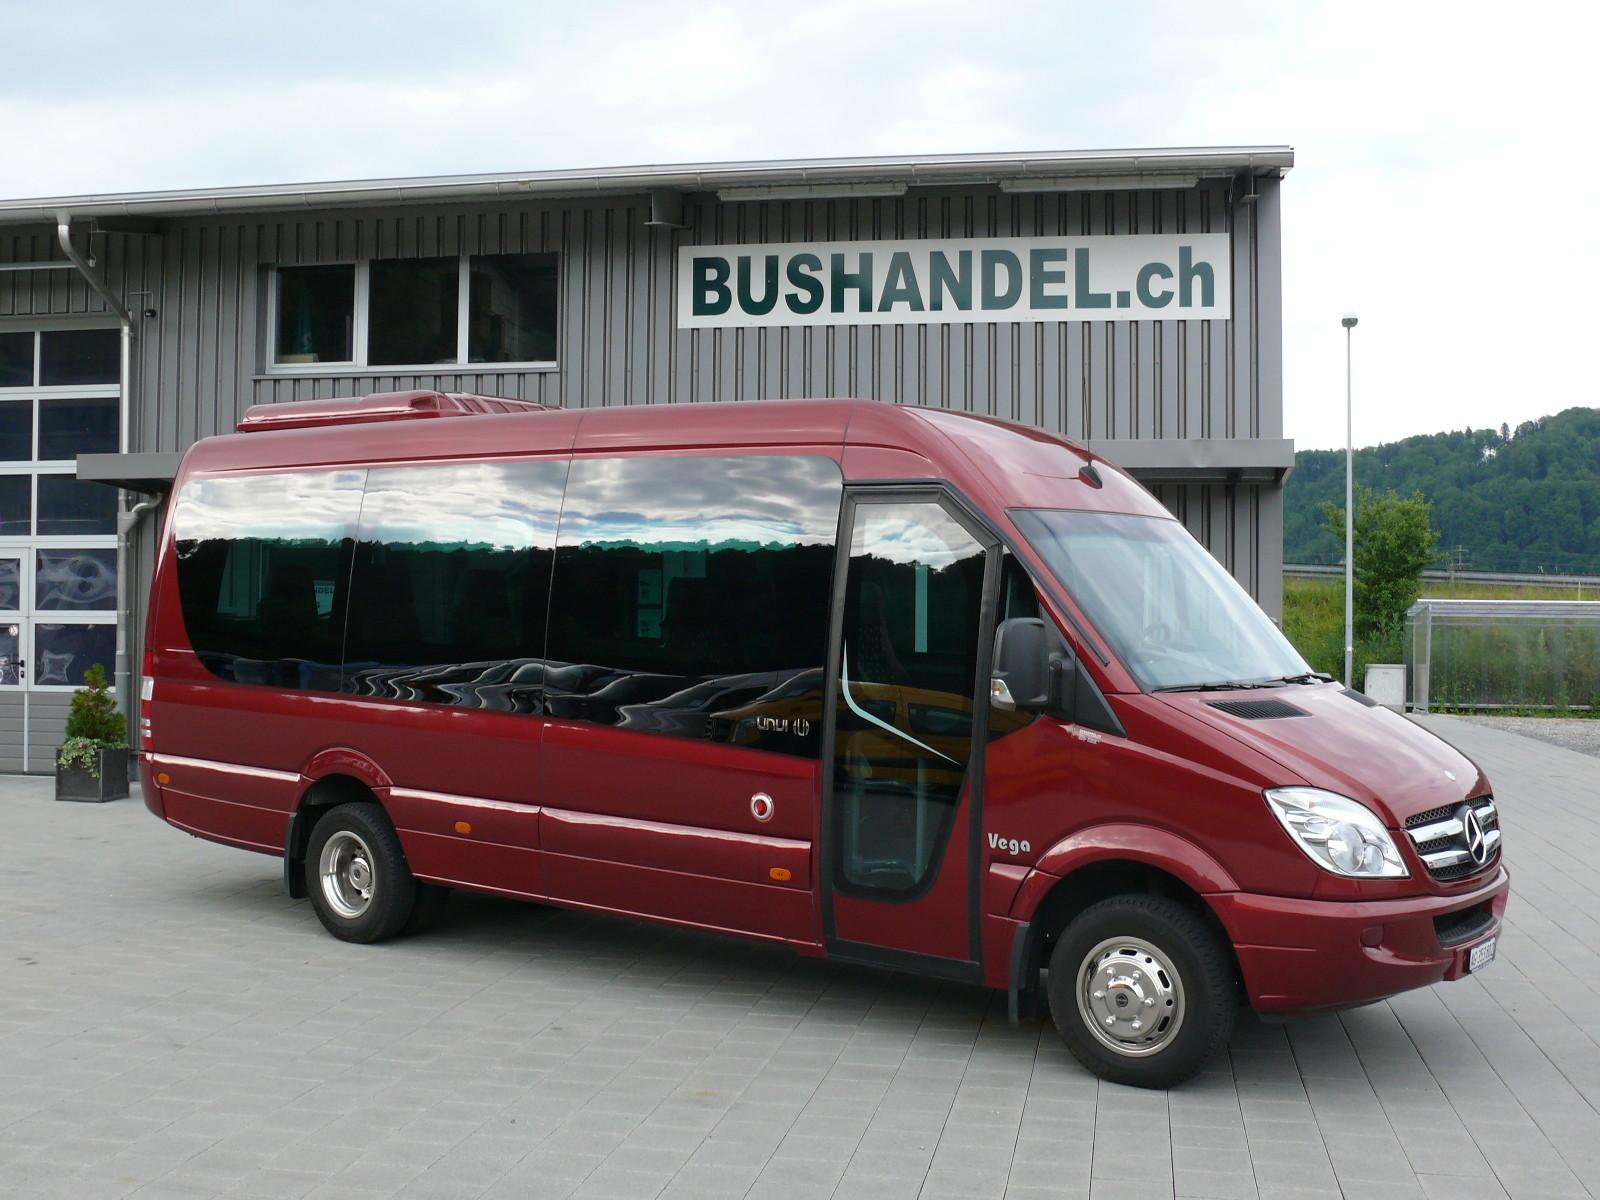 anfrage bus mieten bus kaufen bei ag kleinbusse midibusse vip busse minibus. Black Bedroom Furniture Sets. Home Design Ideas